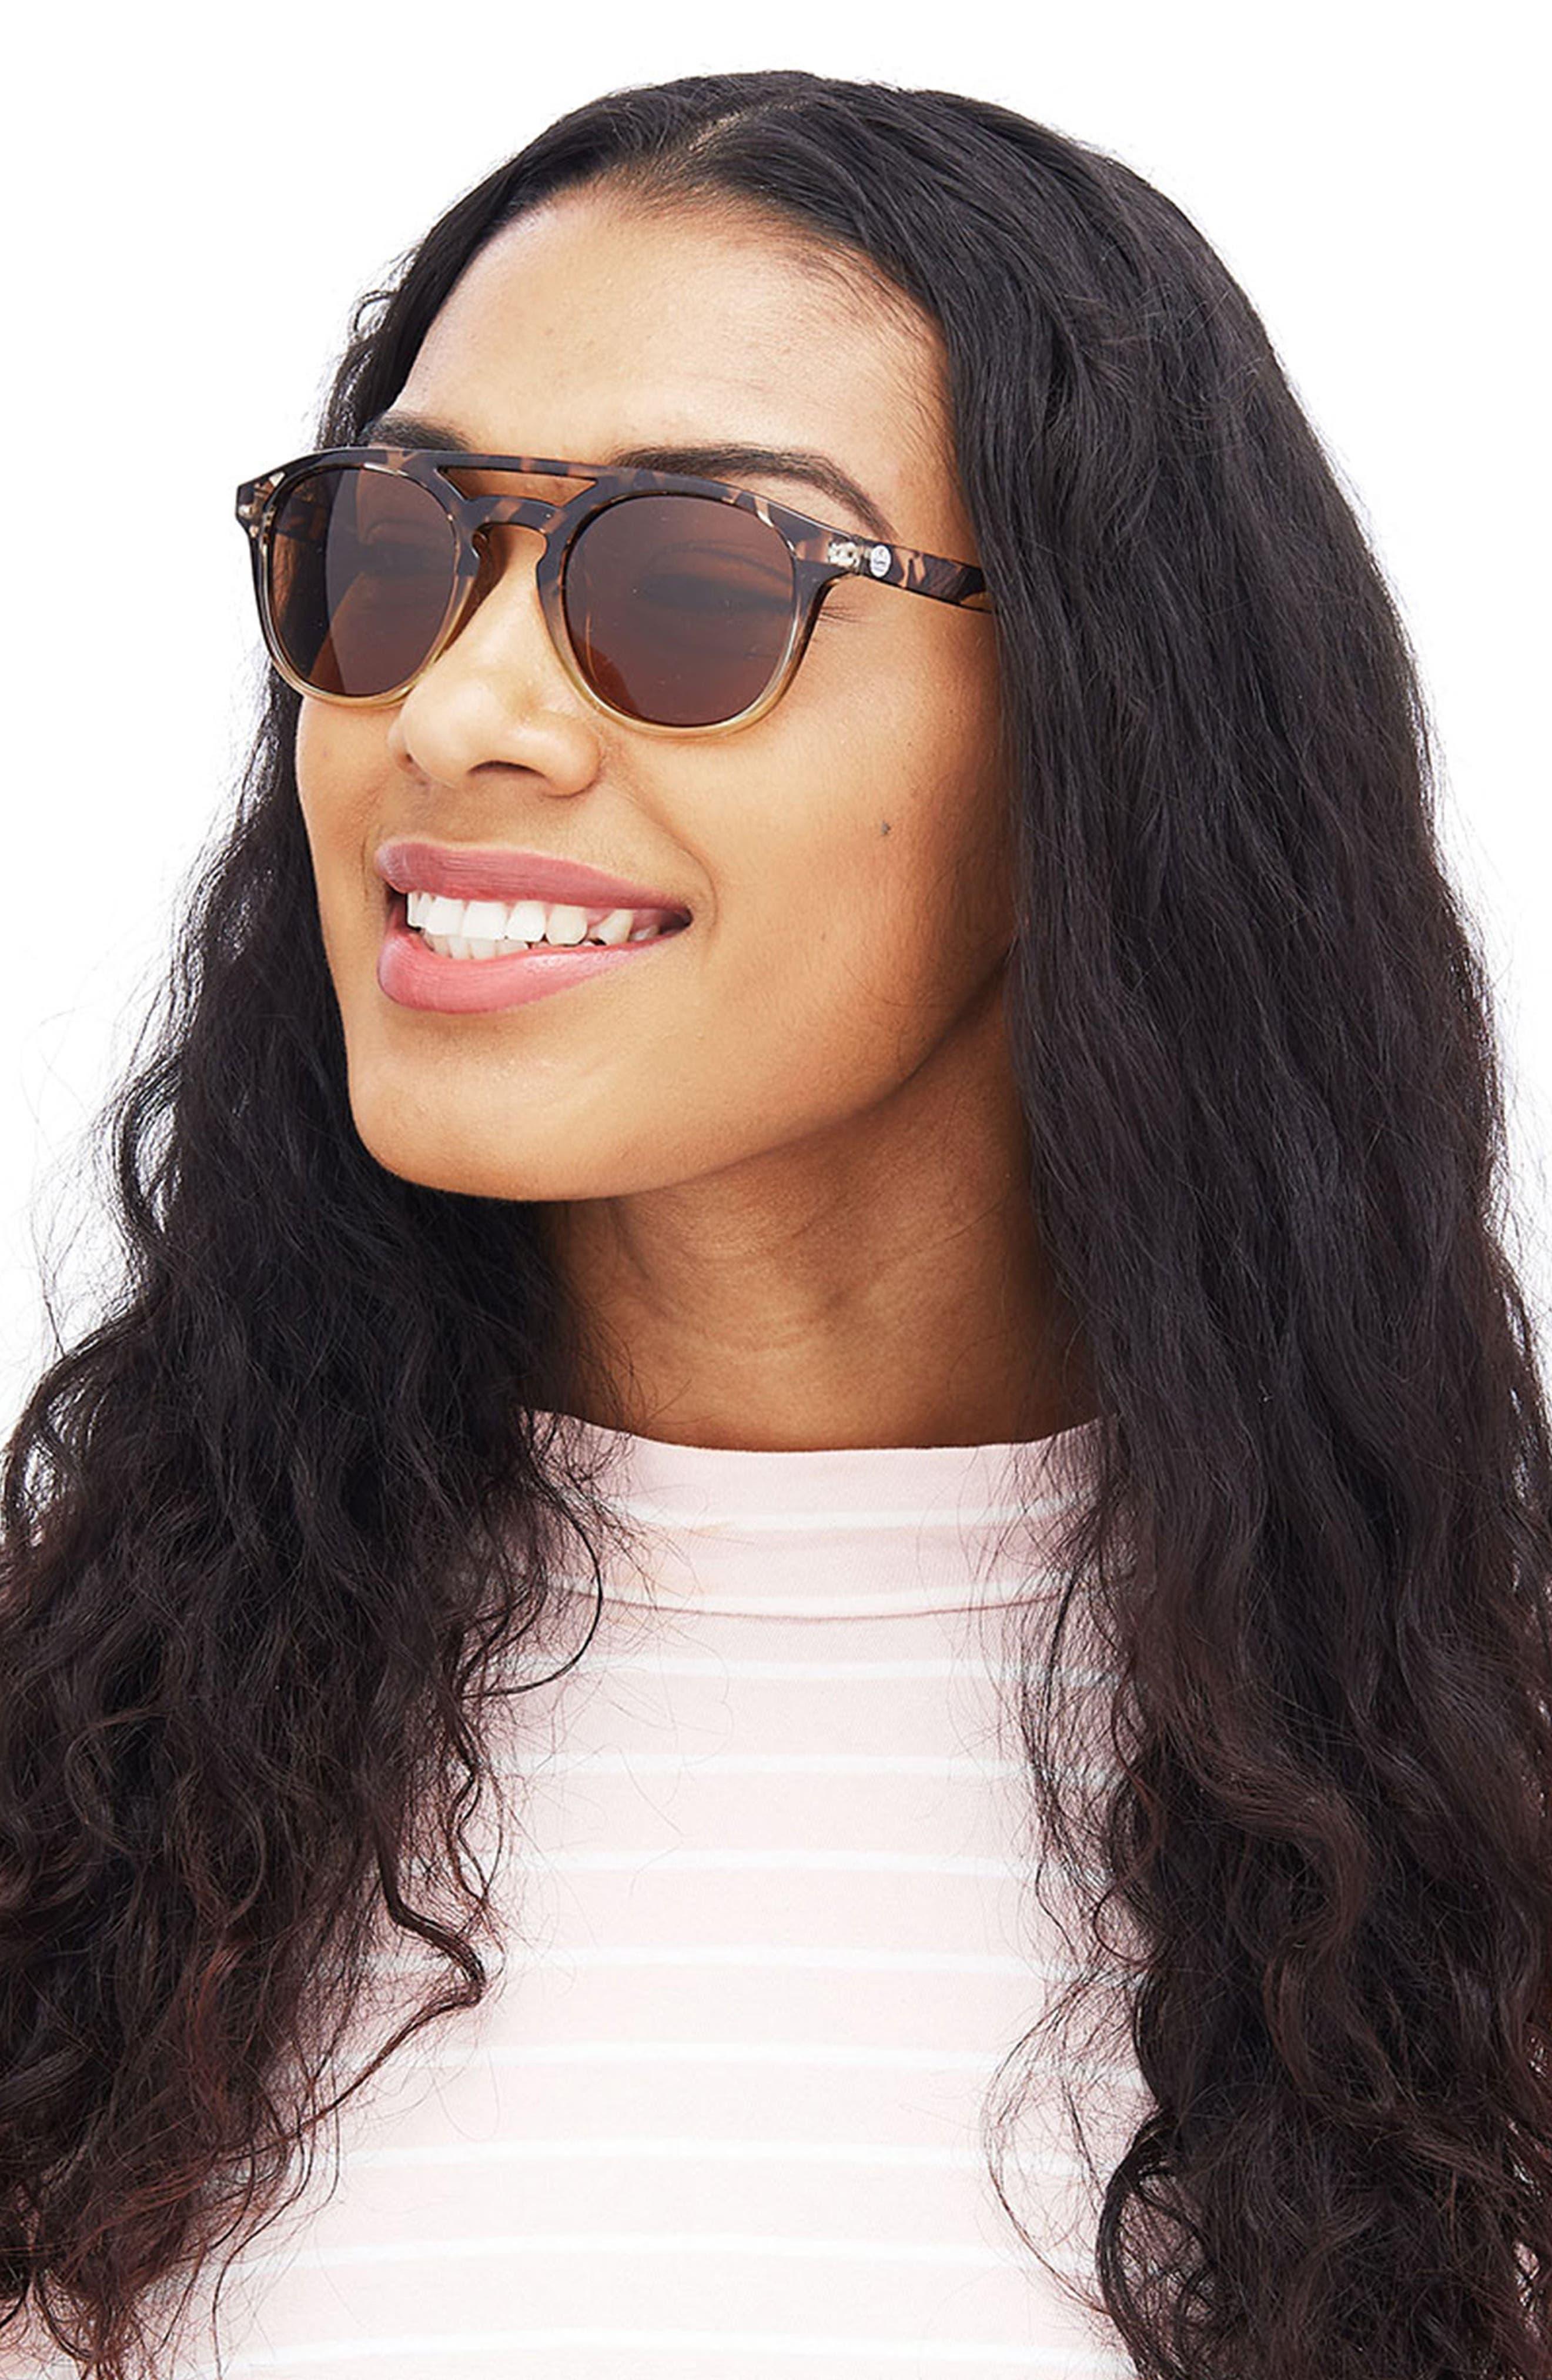 Olema 53mm Polarized Sunglasses,                             Alternate thumbnail 3, color,                             TORTOISE AMBER